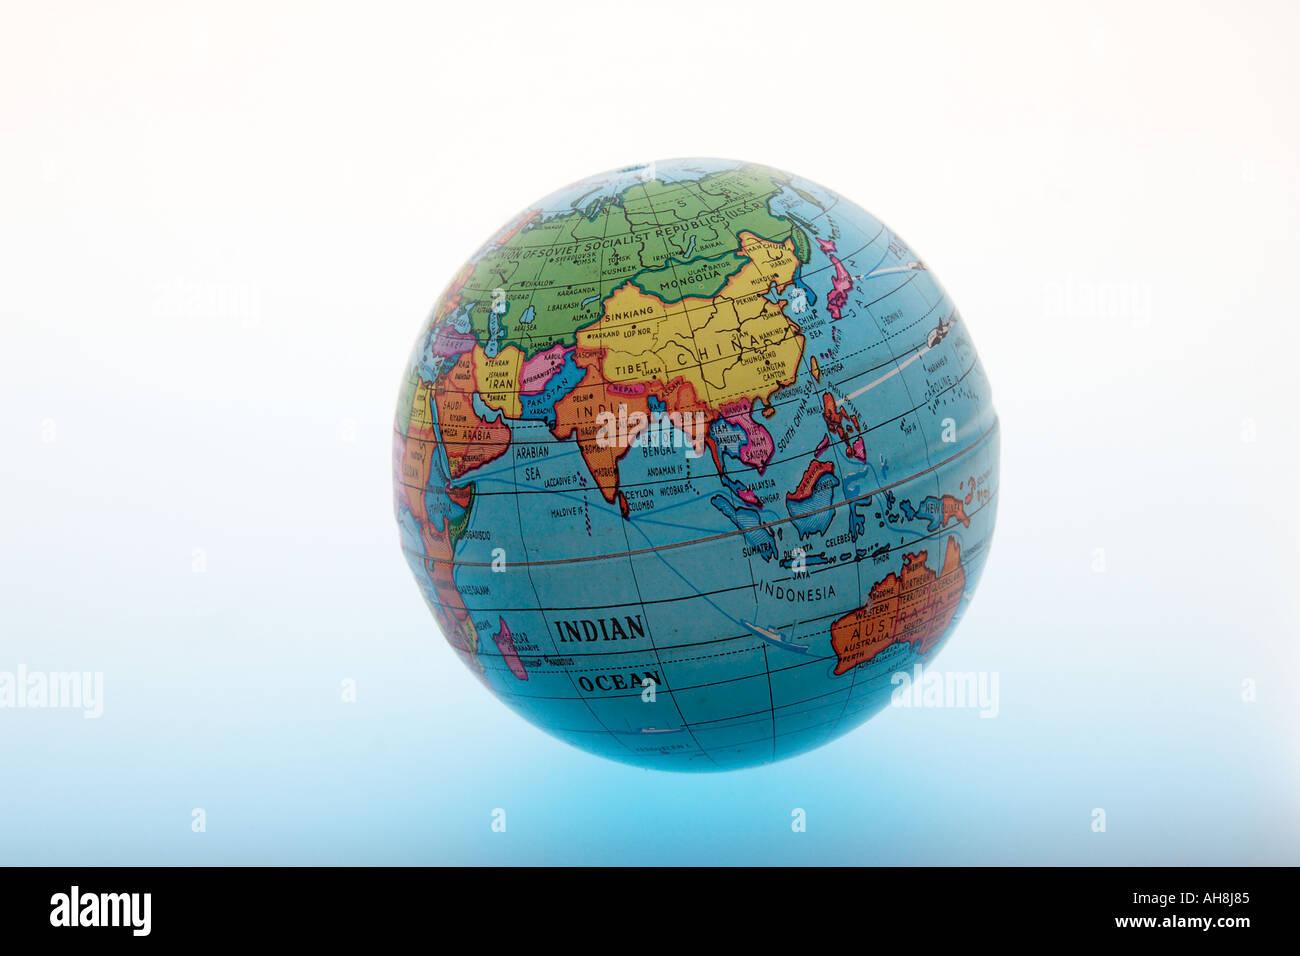 Indian globe concept stock photos indian globe concept stock round globe of world showing asia indian ocean india china sri lanka pakistan indonesia malaysia bangladesh gumiabroncs Choice Image